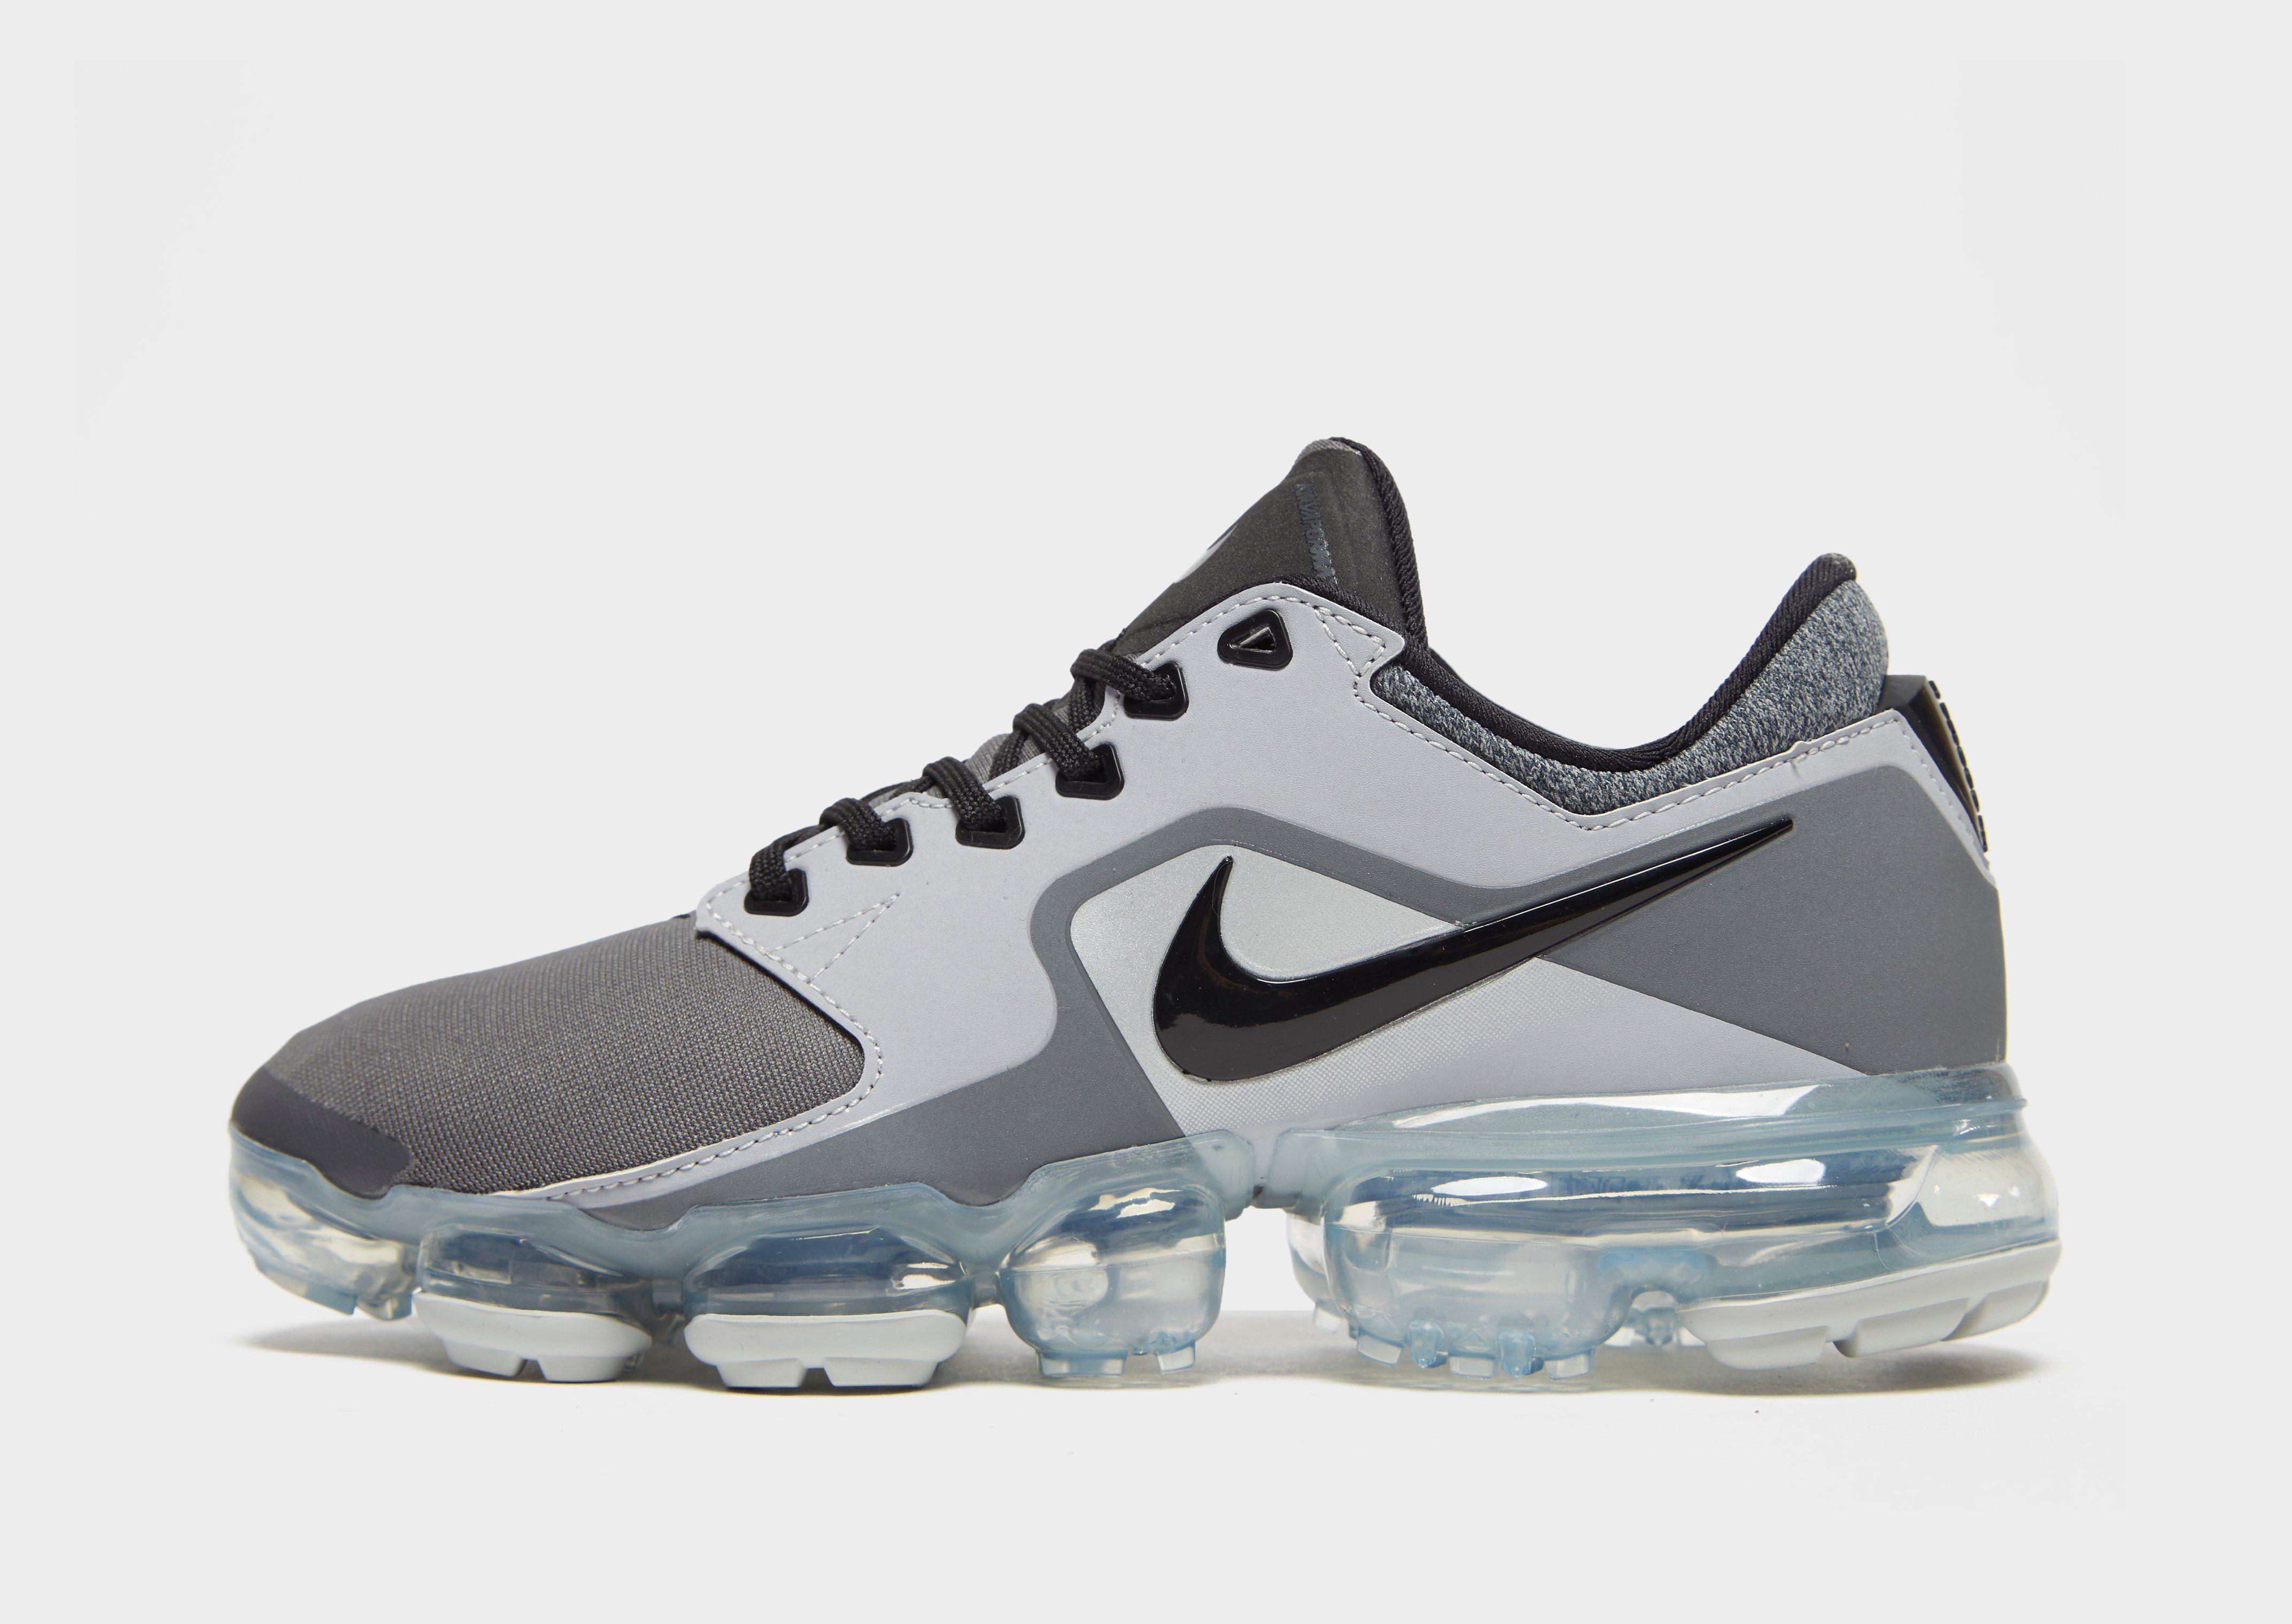 99a44934d4a1 Nike Air VaporMax Junior